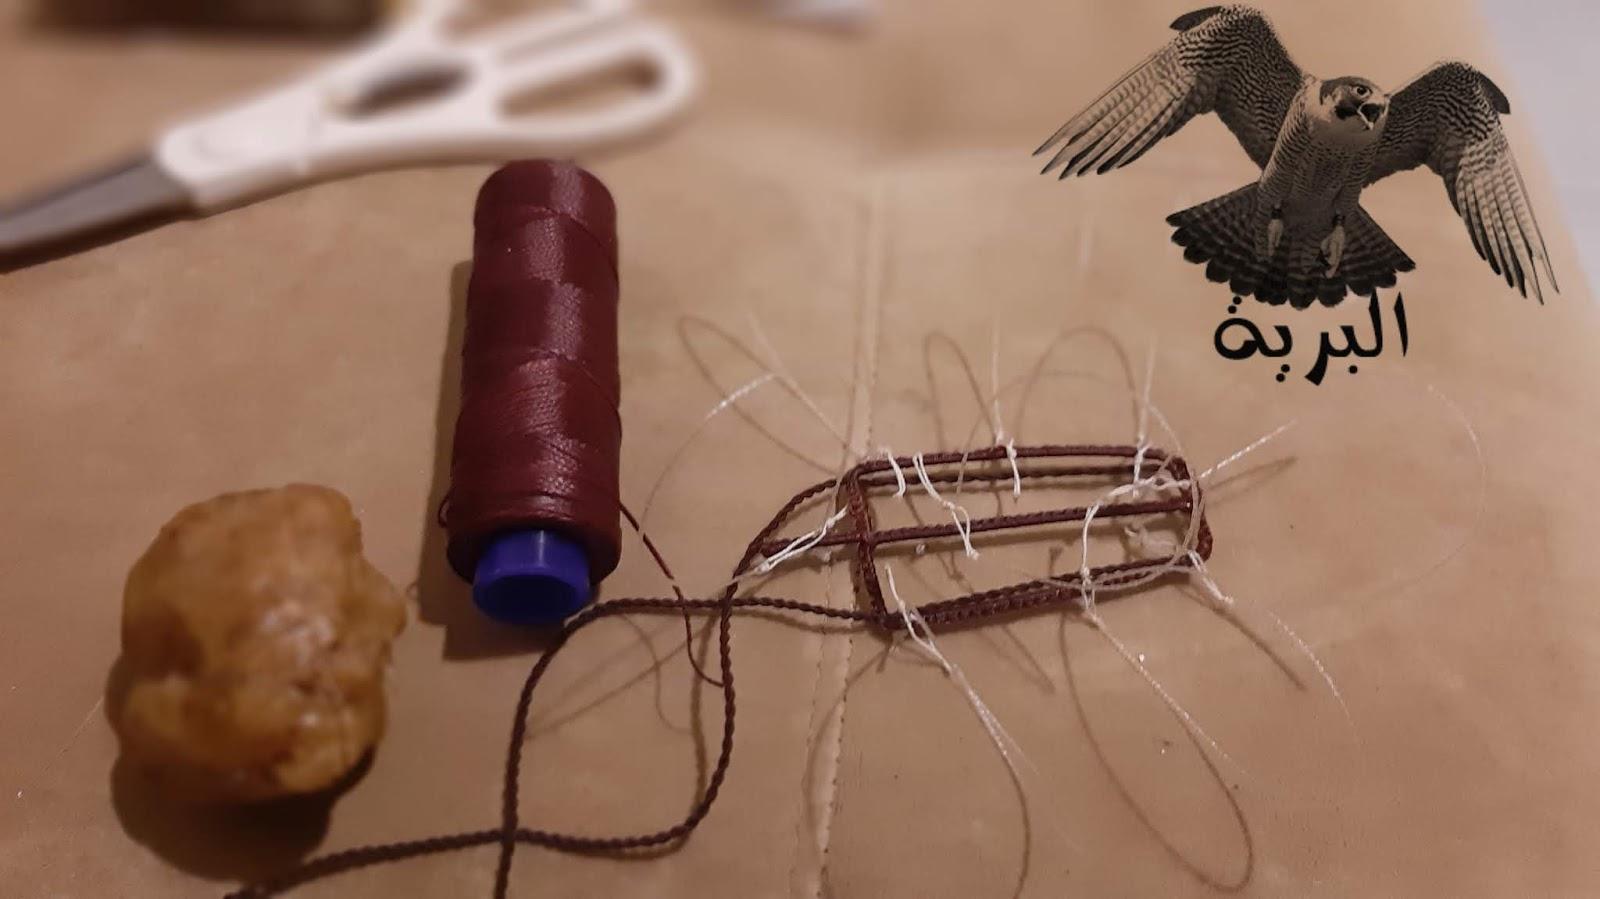 Ritmican Labirint Zahtjev شبك صيد العصافير Tedxdharavi Com